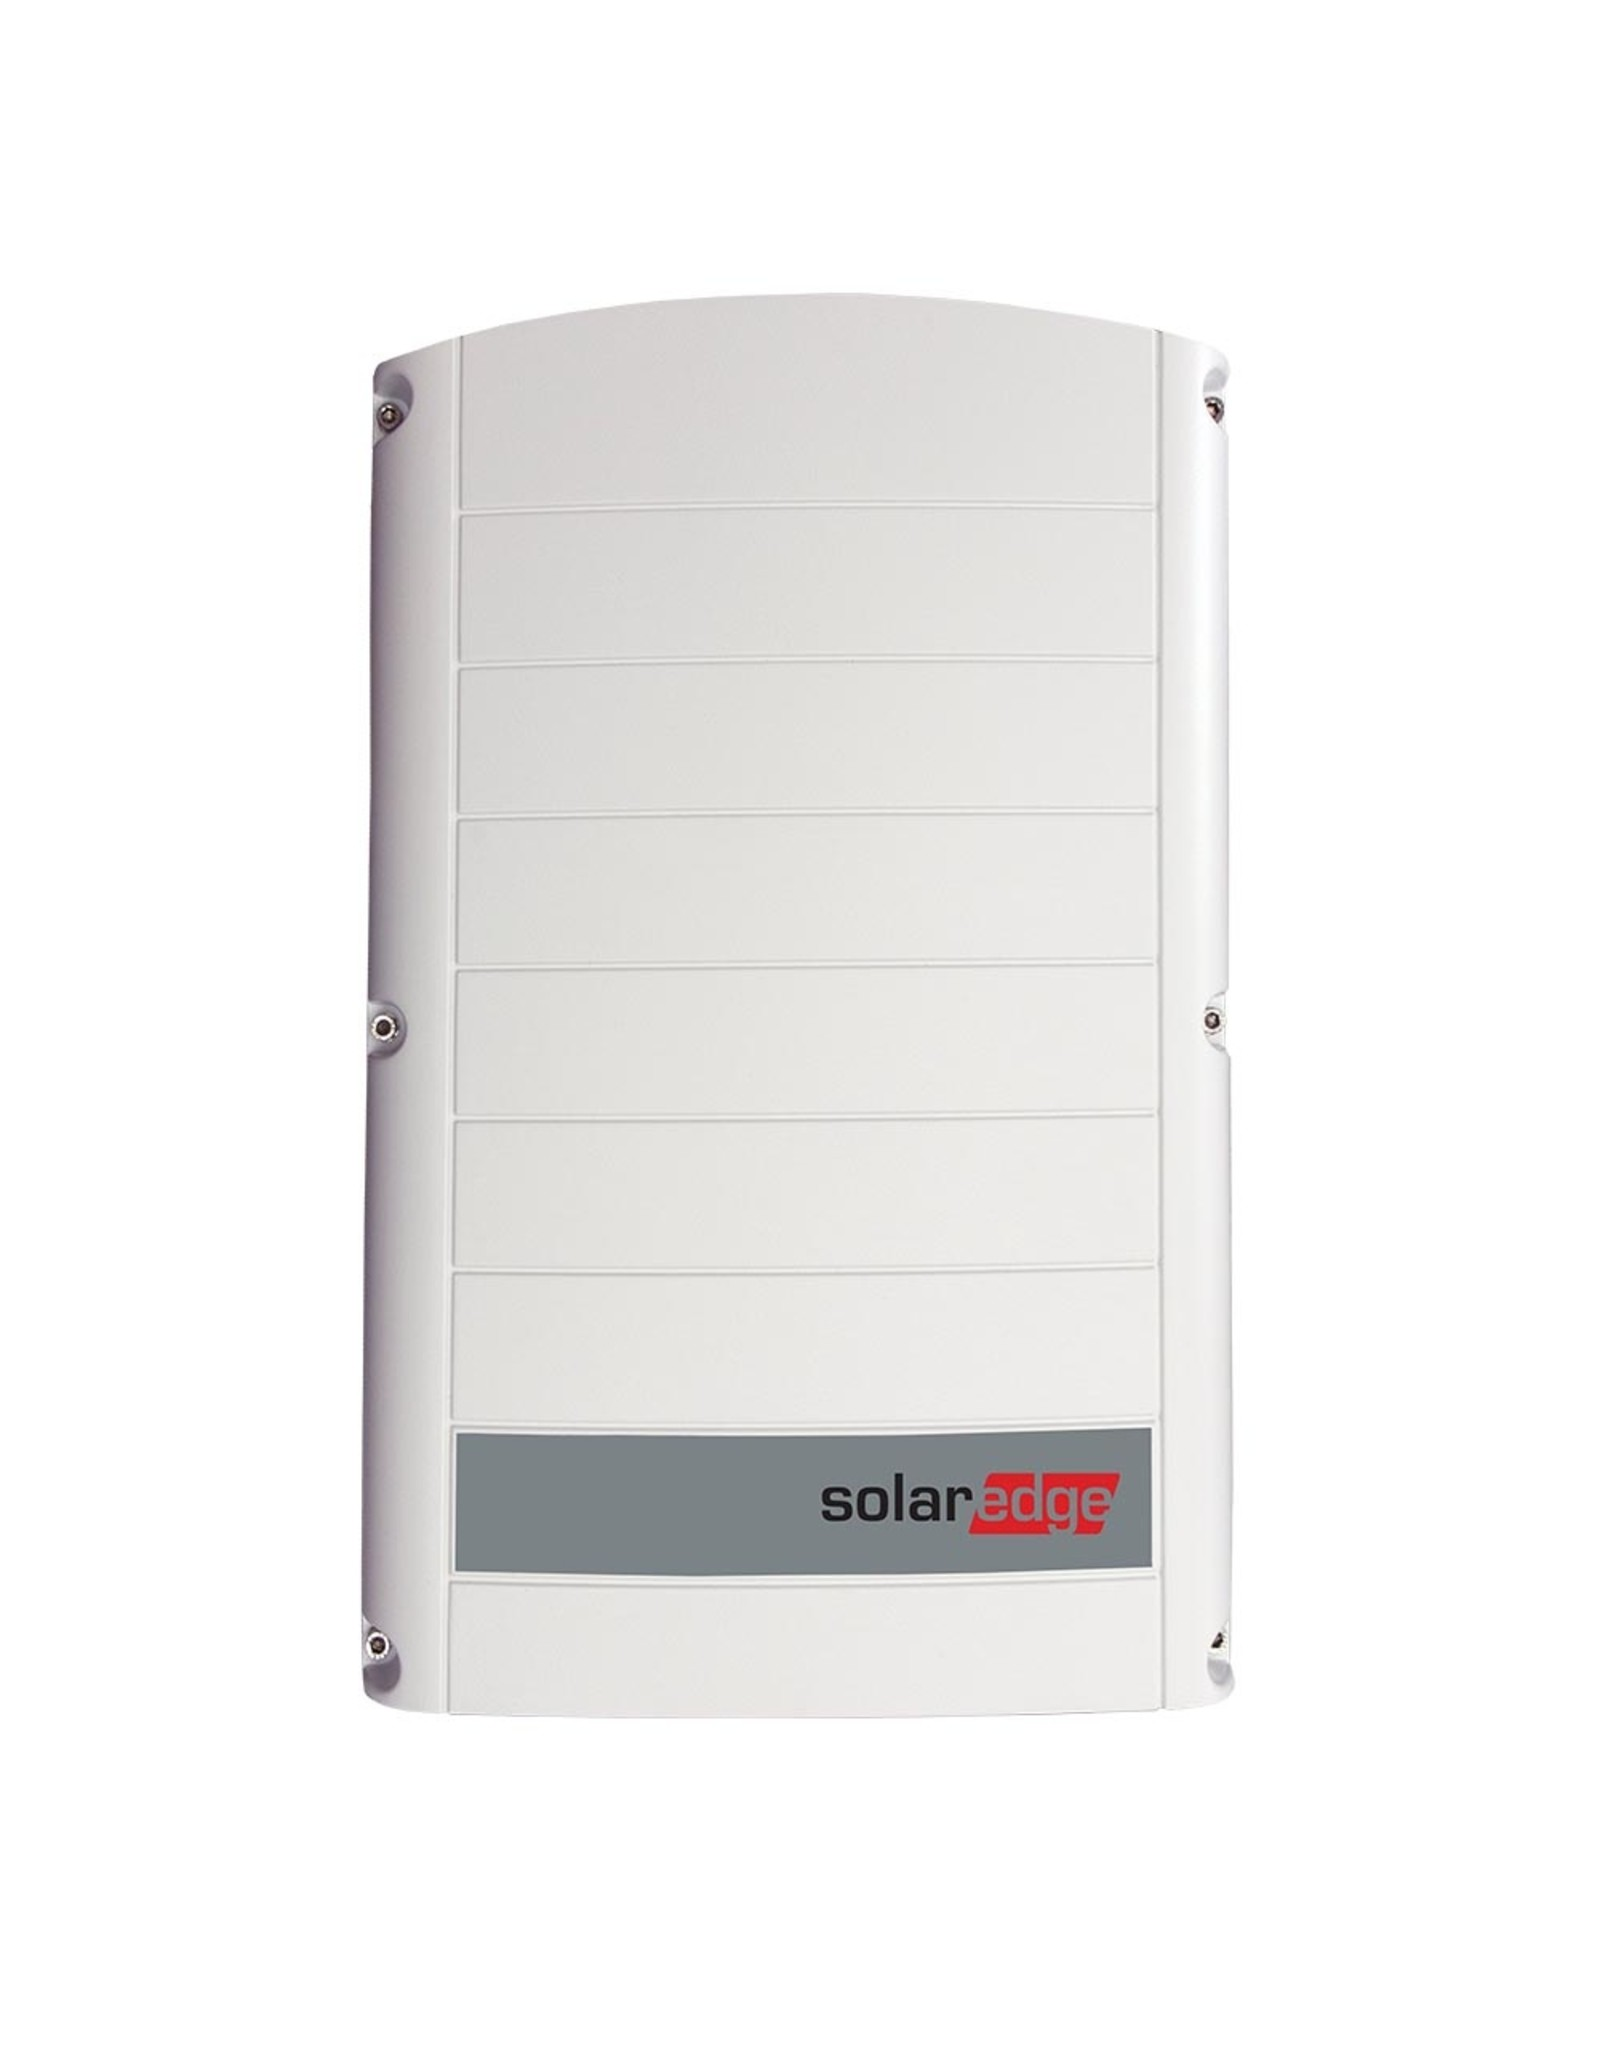 SolarEdge SolarEdge SE5K driefase omvormer 5.0 kW - met SetApp configuratie